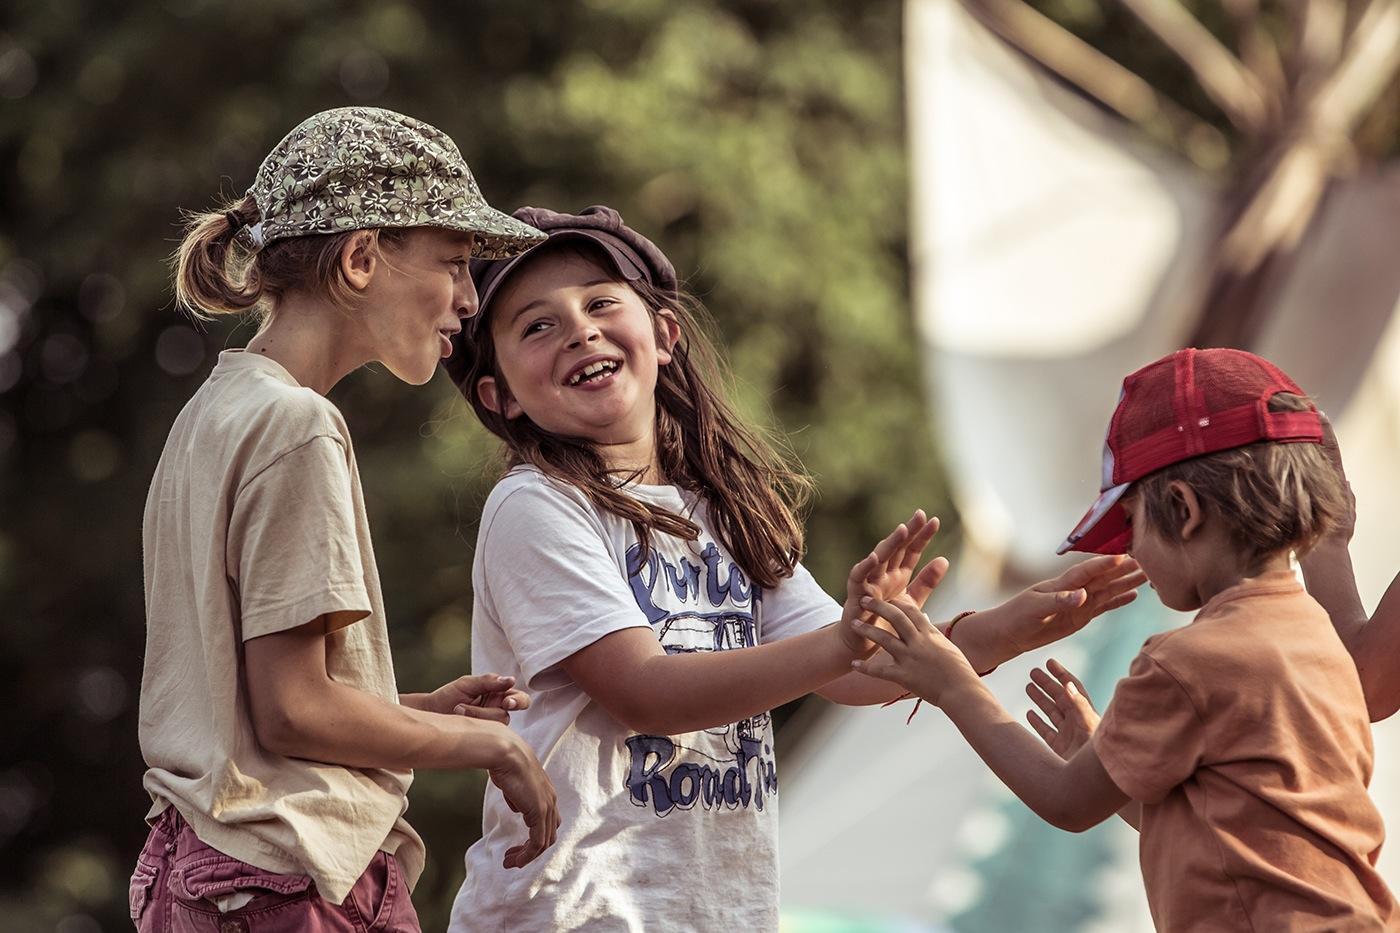 16-photographe-reportage-reve-de-laborigene-2016-guillaume-heraud-enfants-rires-small